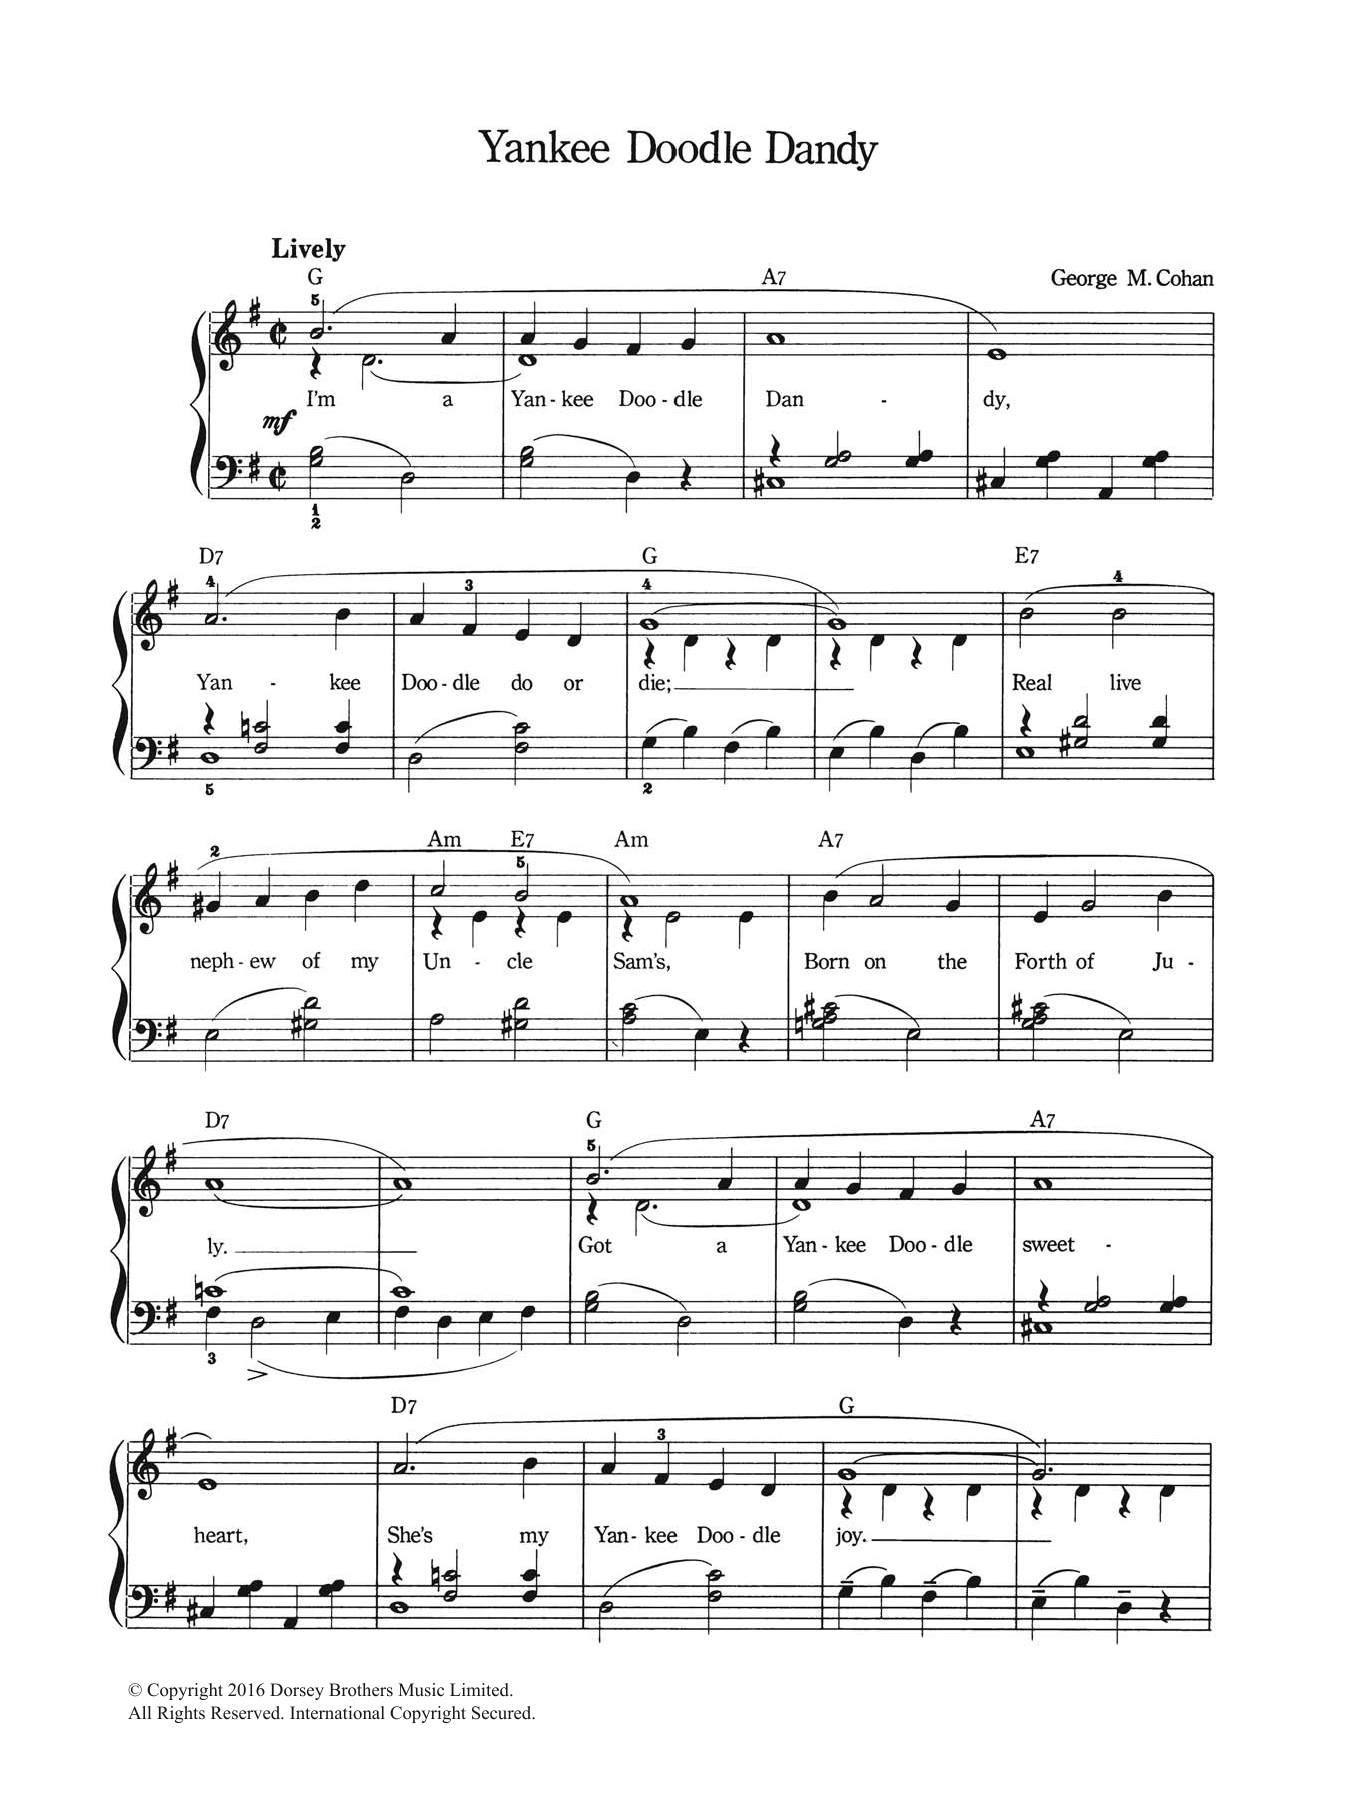 George M. Cohan - Yankee Doodle Dandy